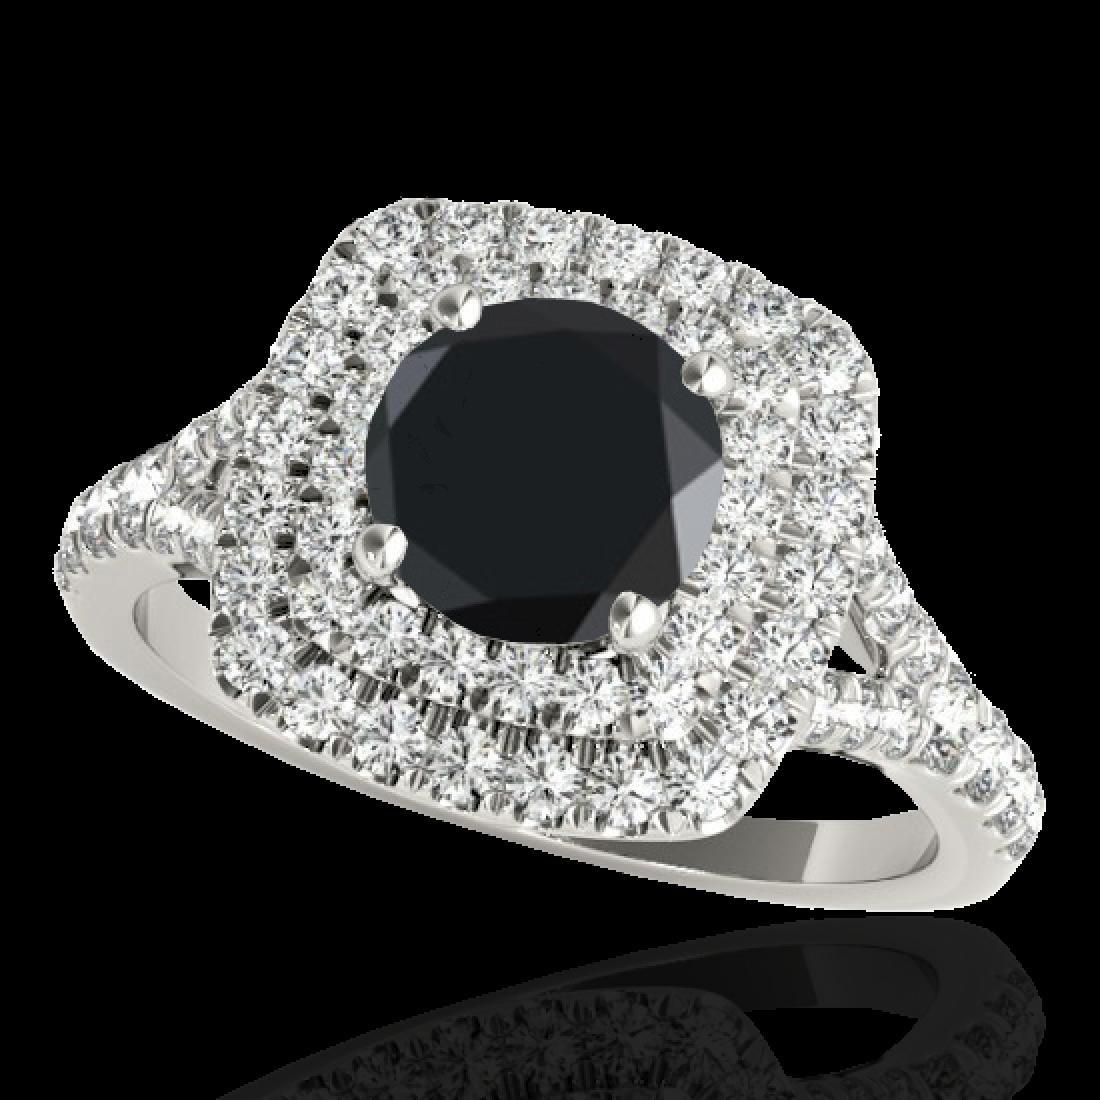 1.6 CTW Certified VS Black Diamond Solitaire Halo Ring